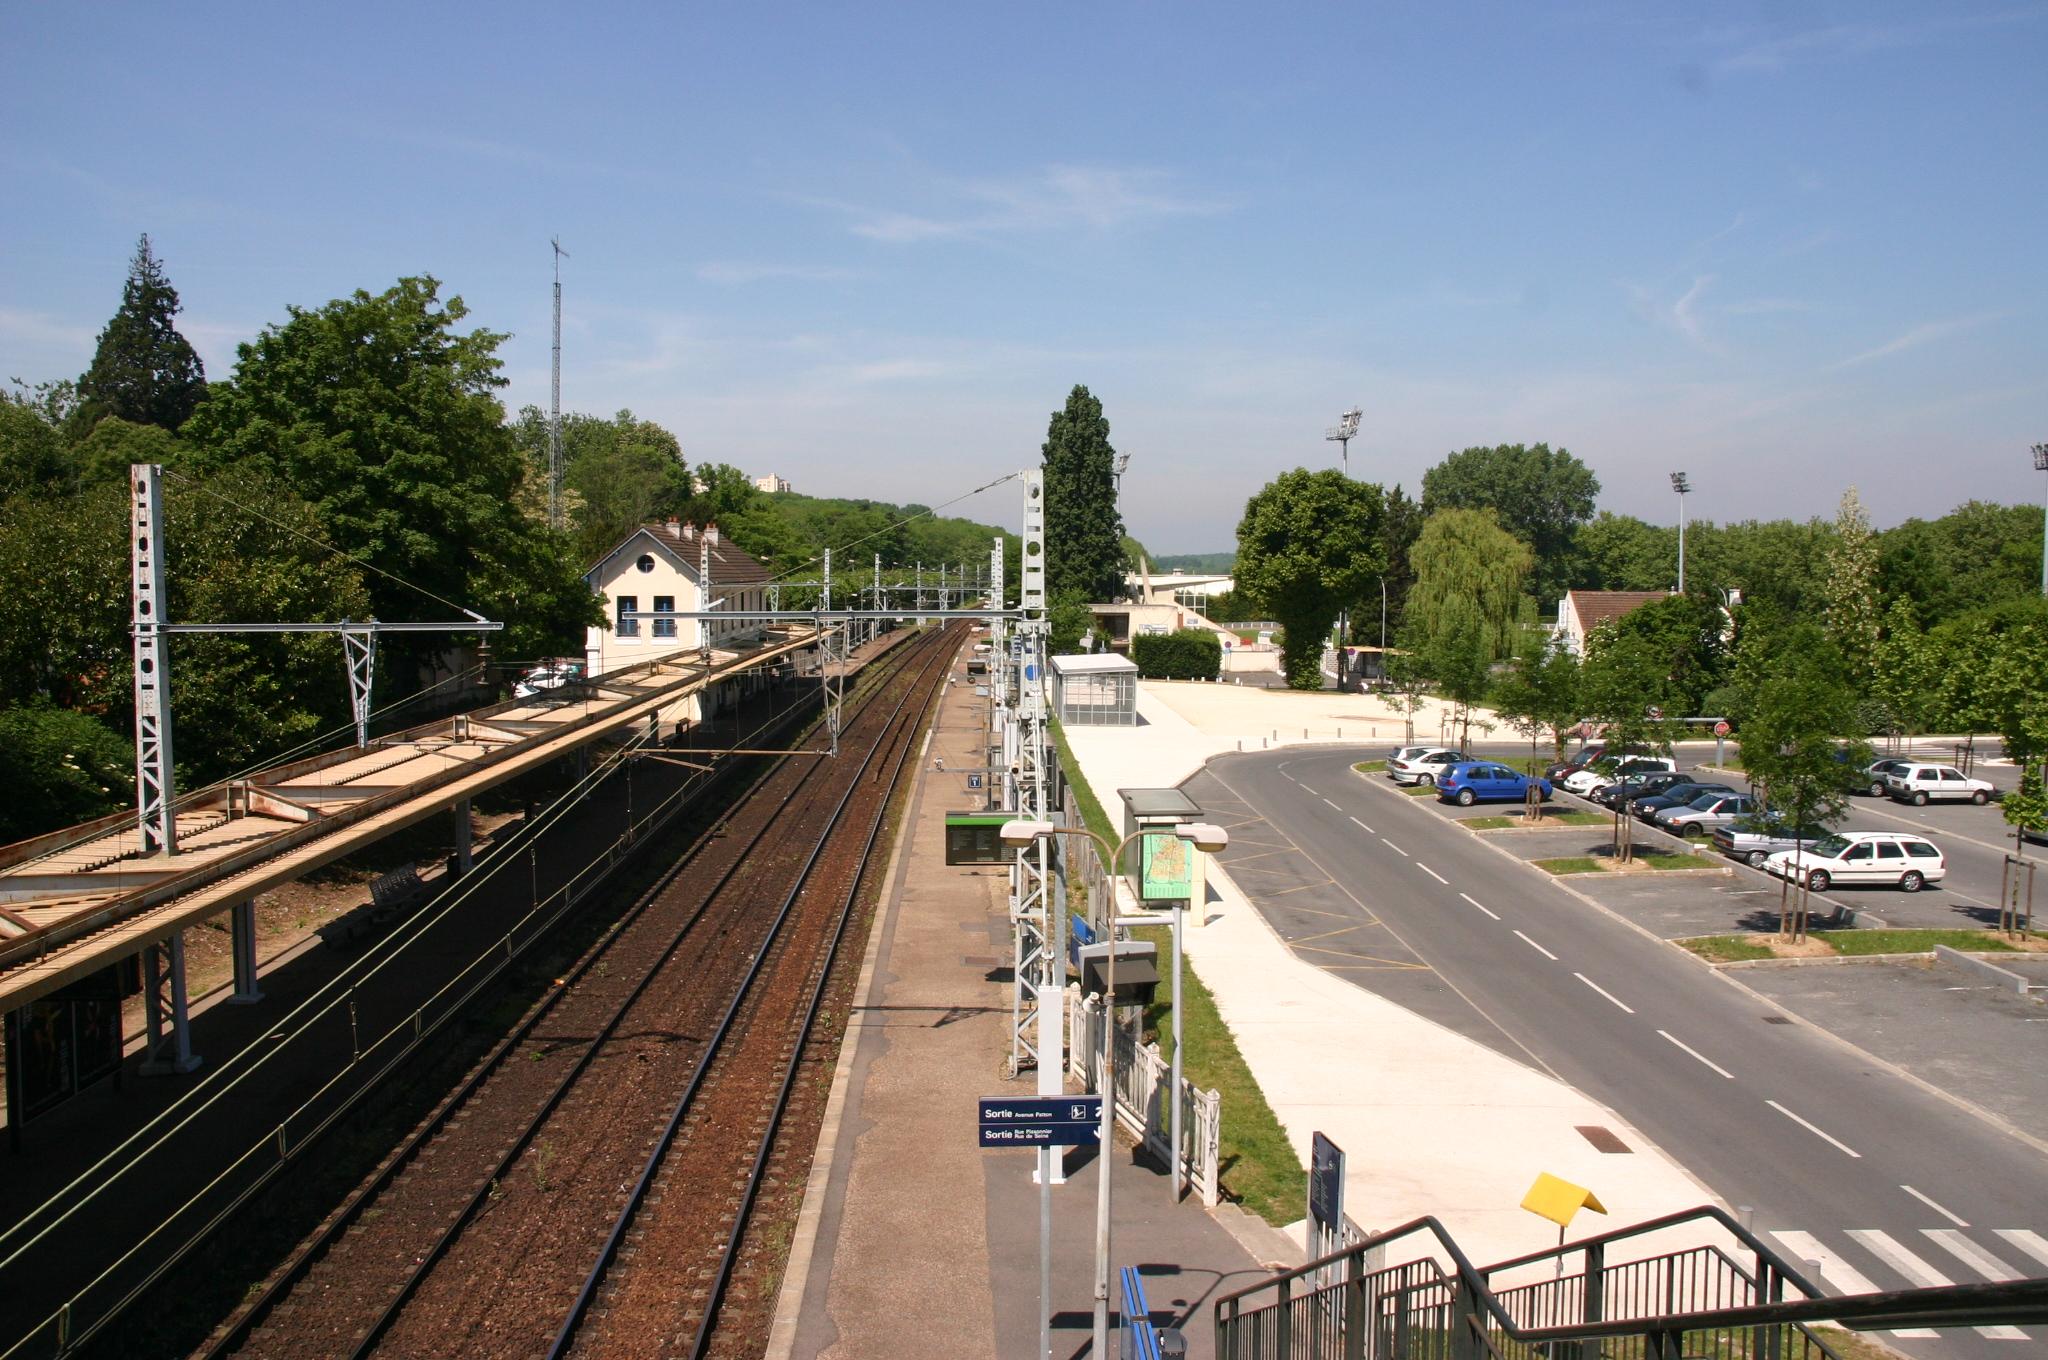 https://upload.wikimedia.org/wikipedia/commons/b/be/Gare_de_Evry_IMG_4651.JPG